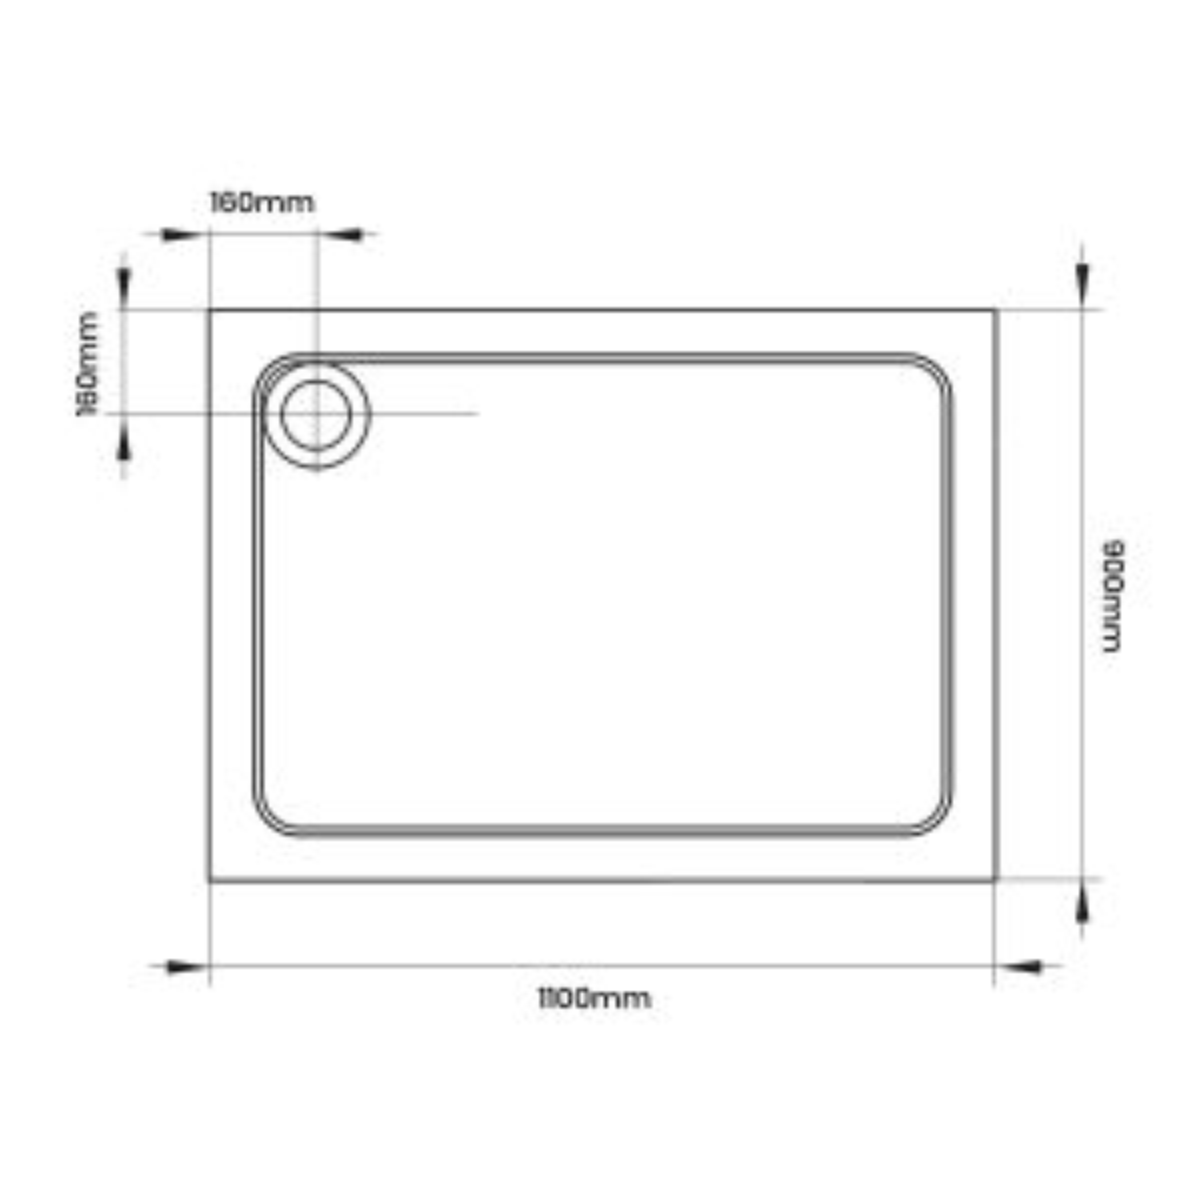 April Rectangular Anti Slip Shower Tray 1100 x 760 Line Drawing